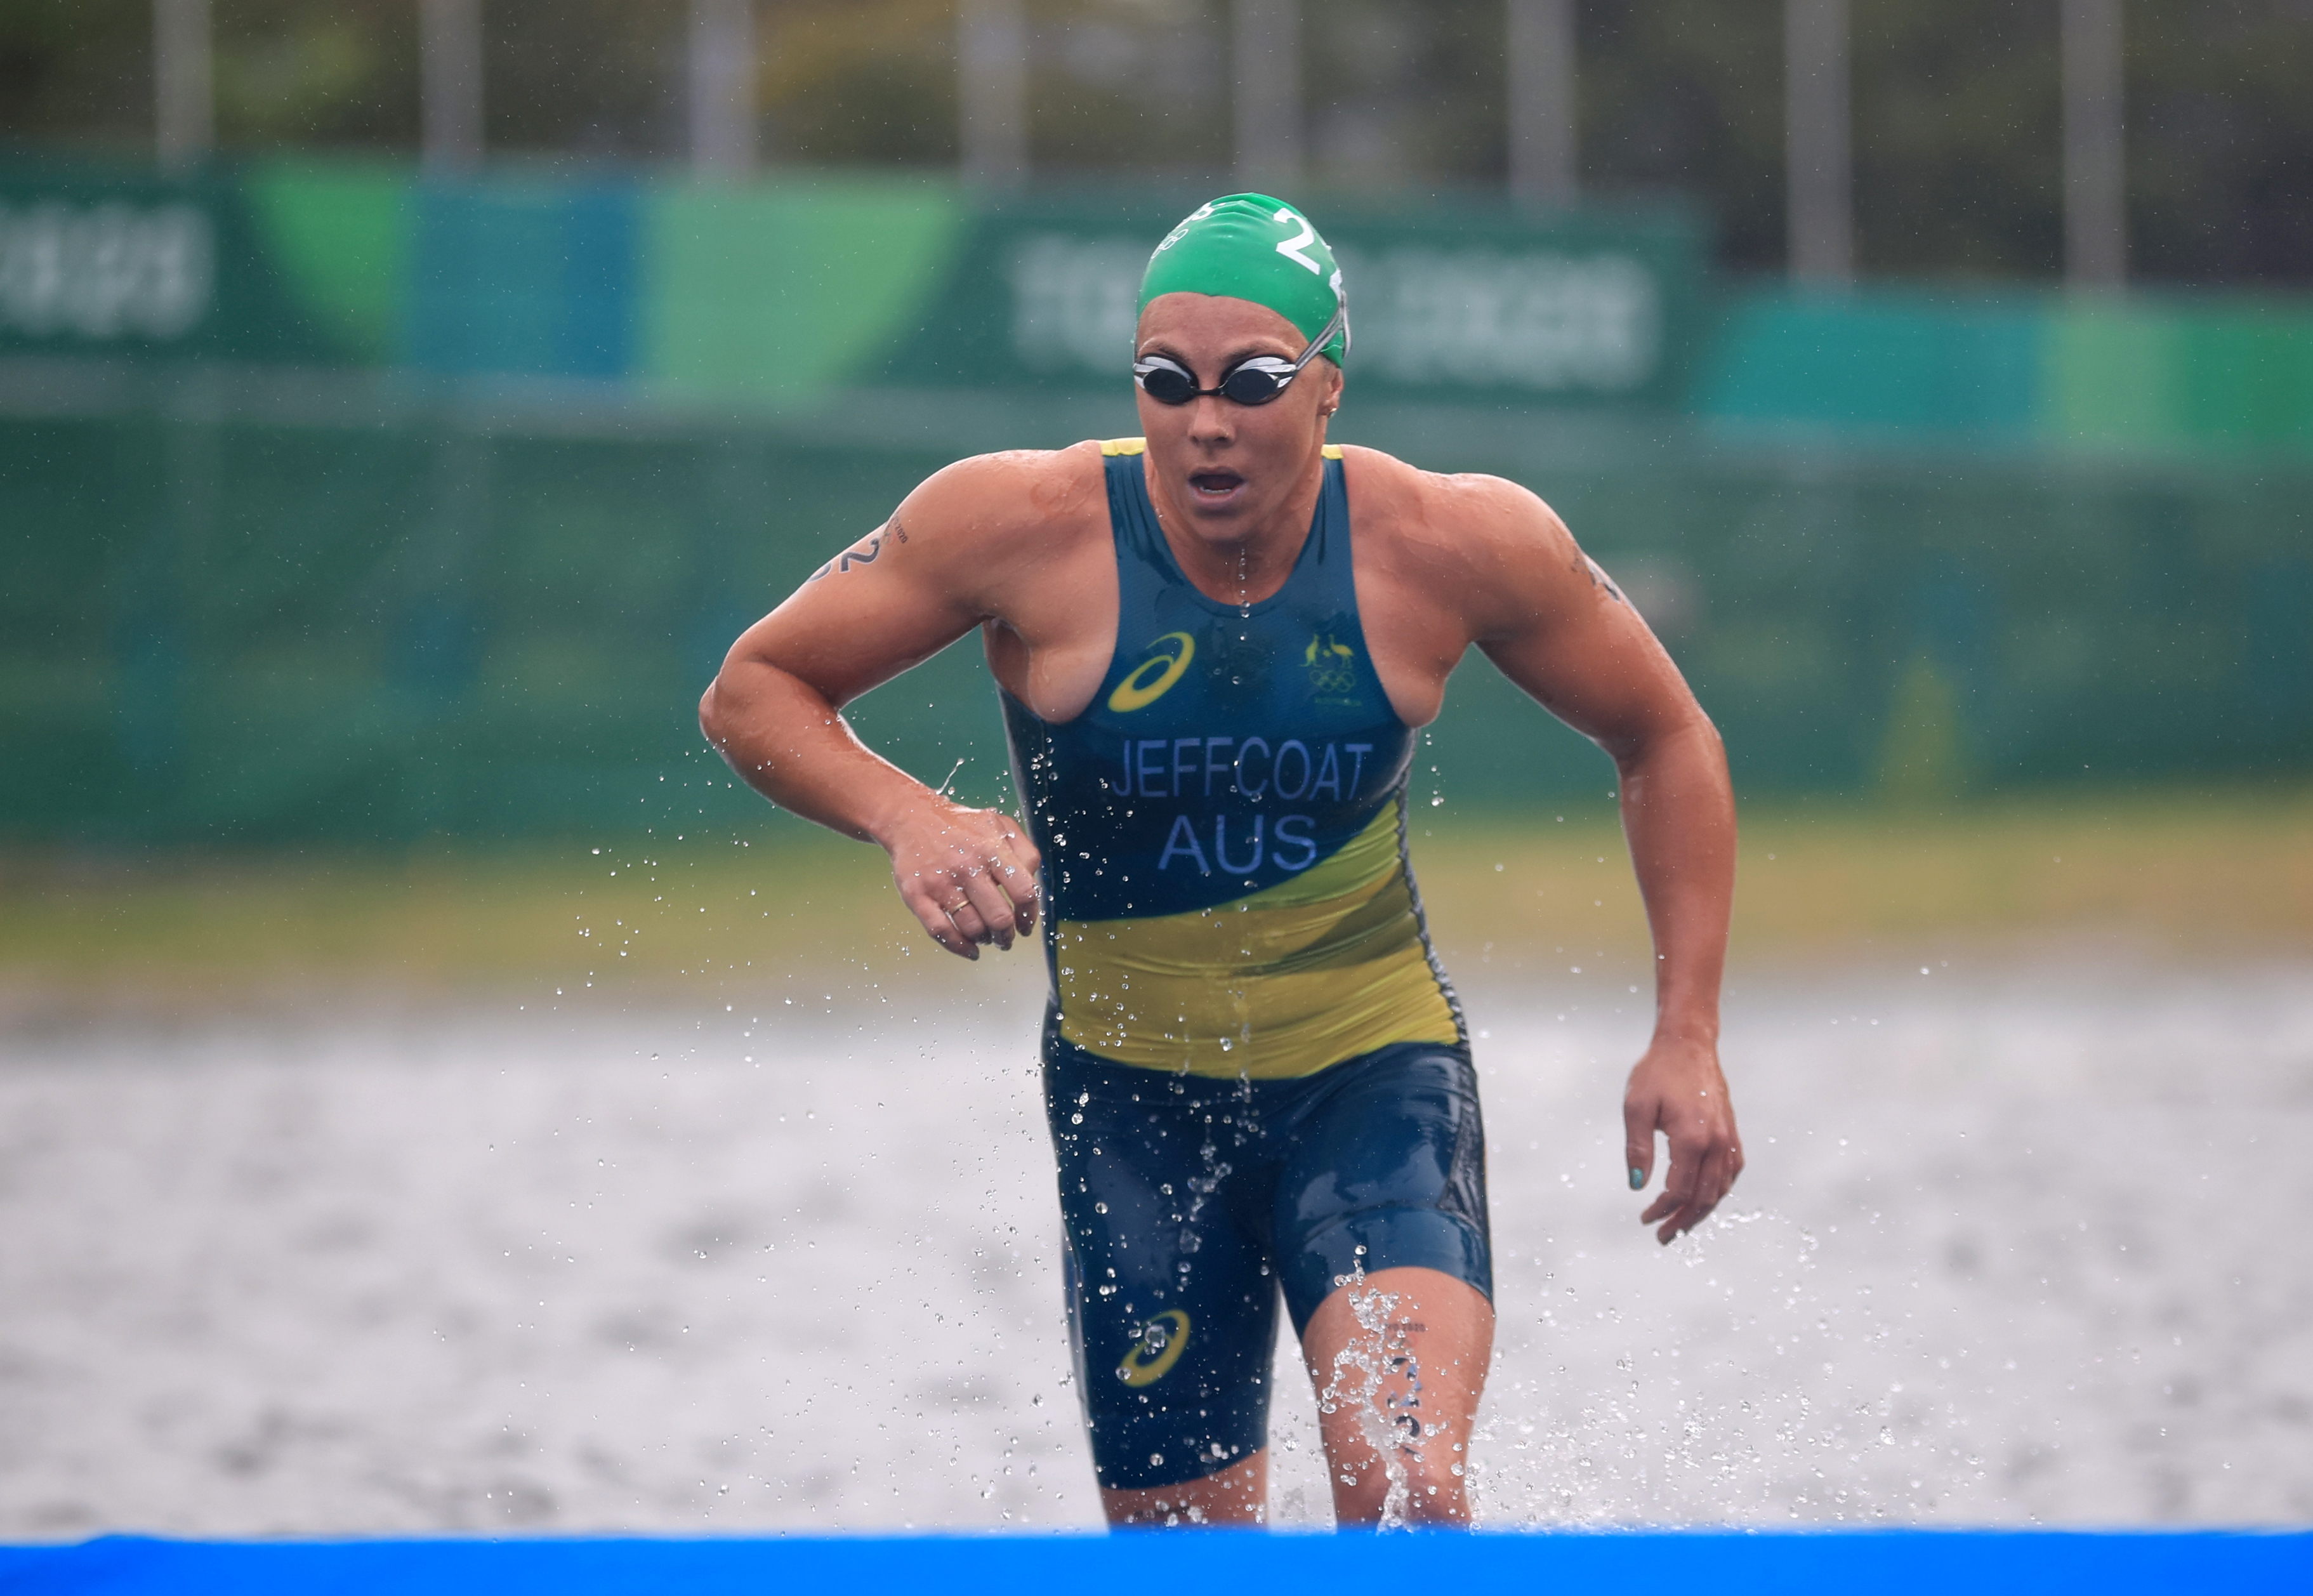 Tokyo 2020 Olympics - Triathlon - Women's Olympic Distance - Final - Odaiba Marine Park, Tokyo, Japan July 27, 2021. Emma Jeffcoat of Australia in action. REUTERS/Hannah Mckay